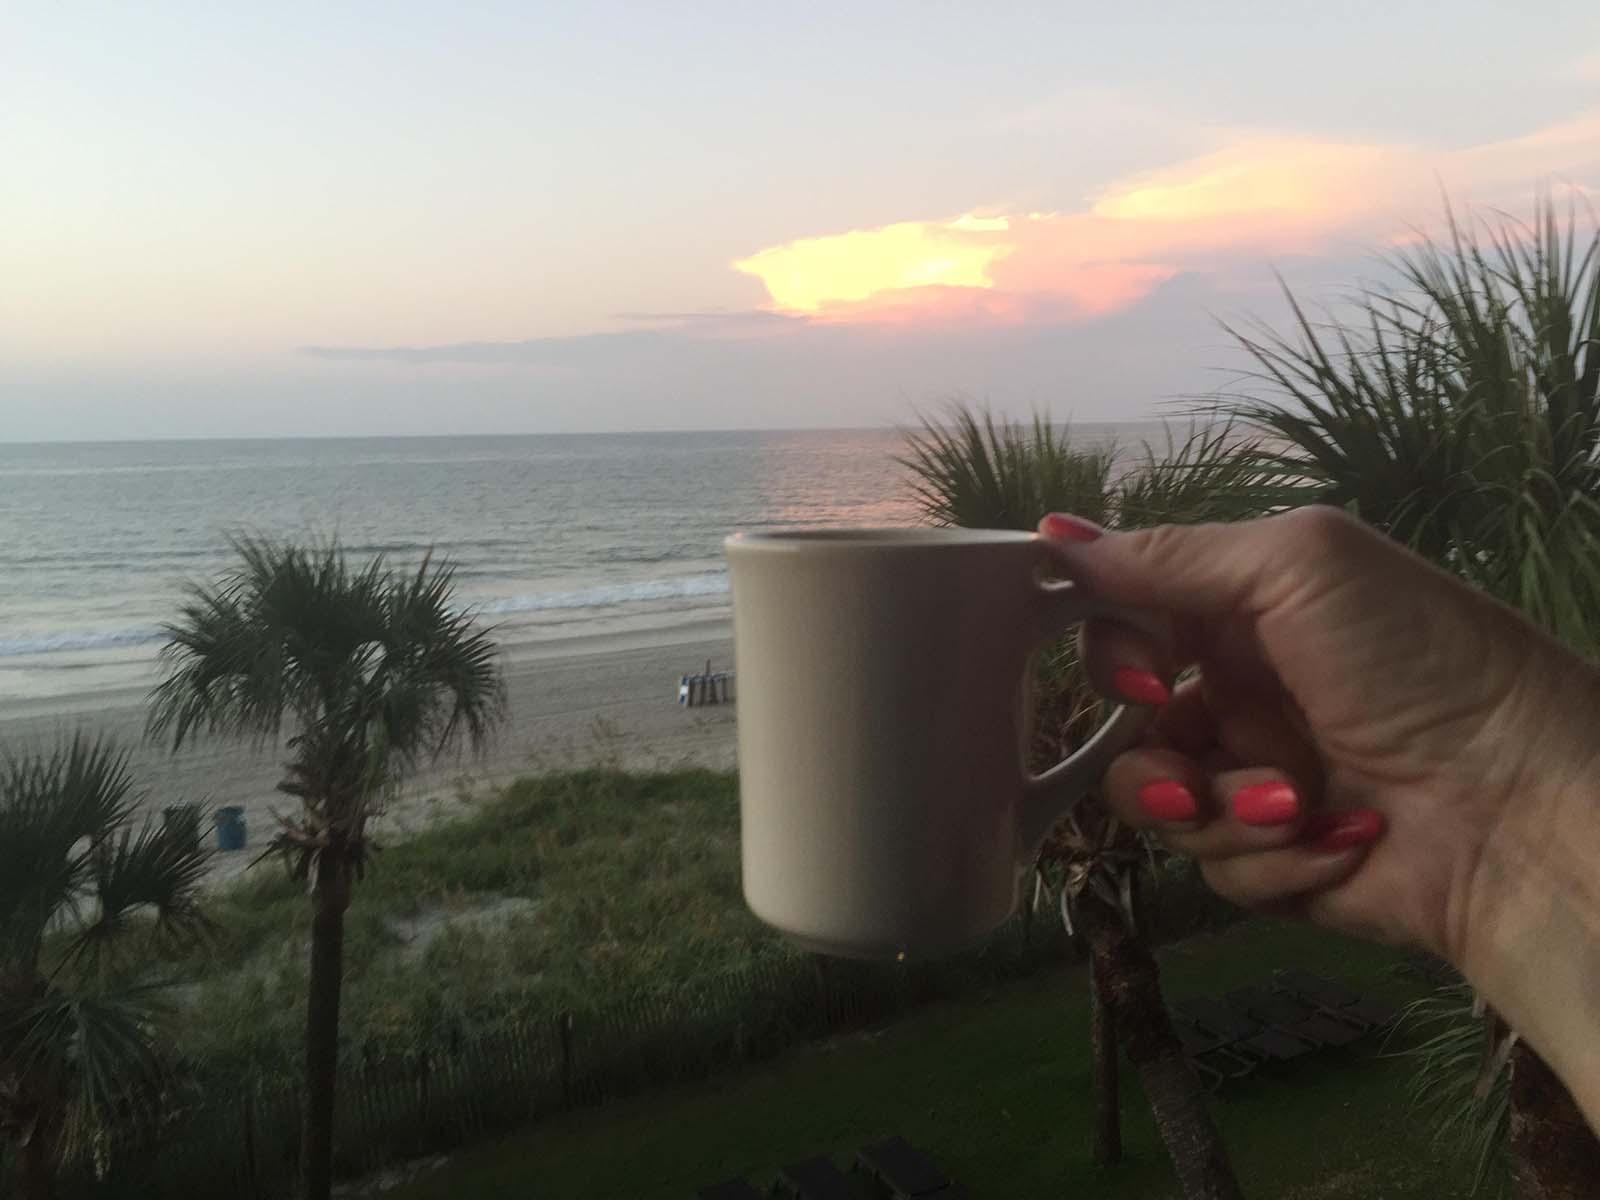 Holding coffee on balcony